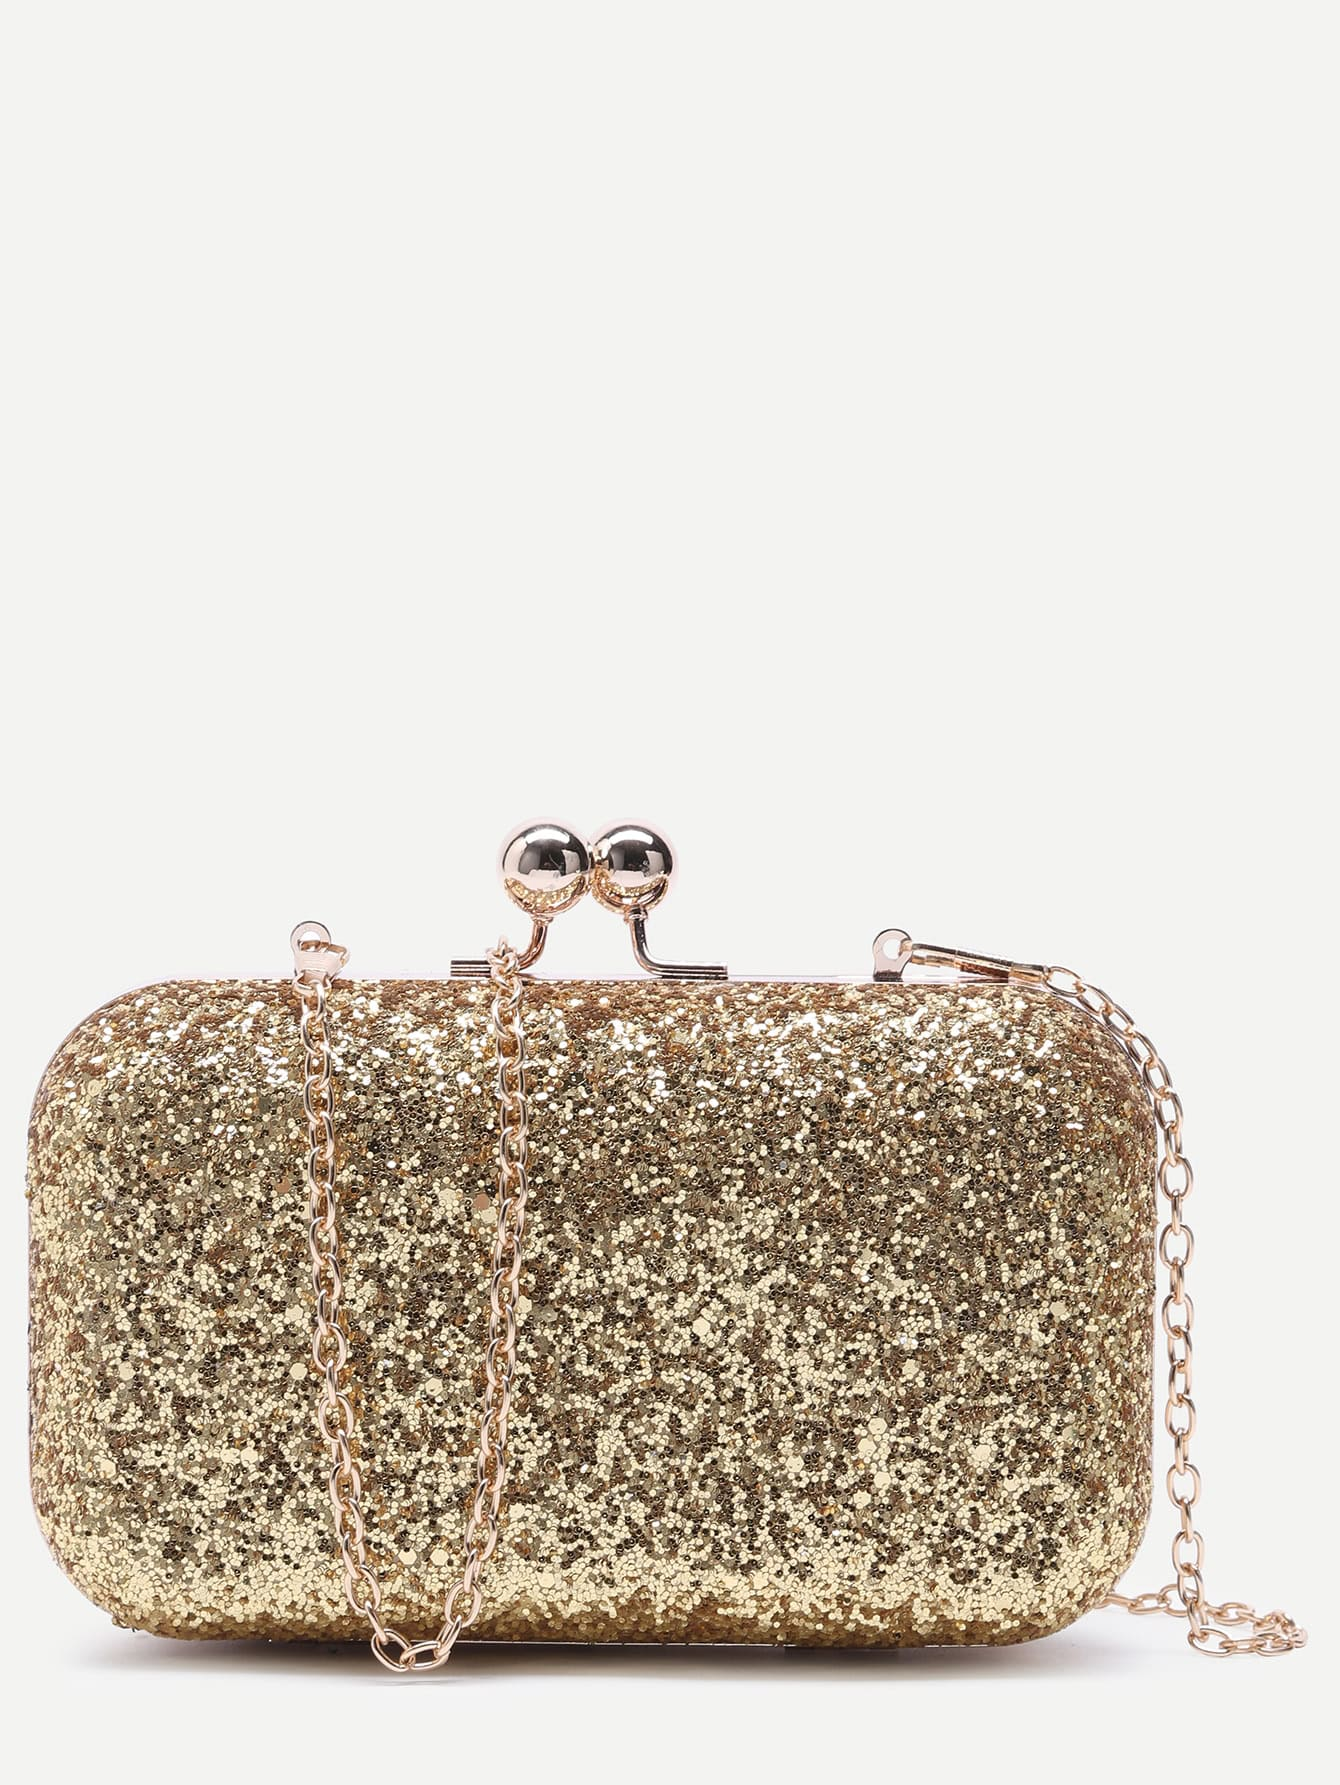 bag161018911_2